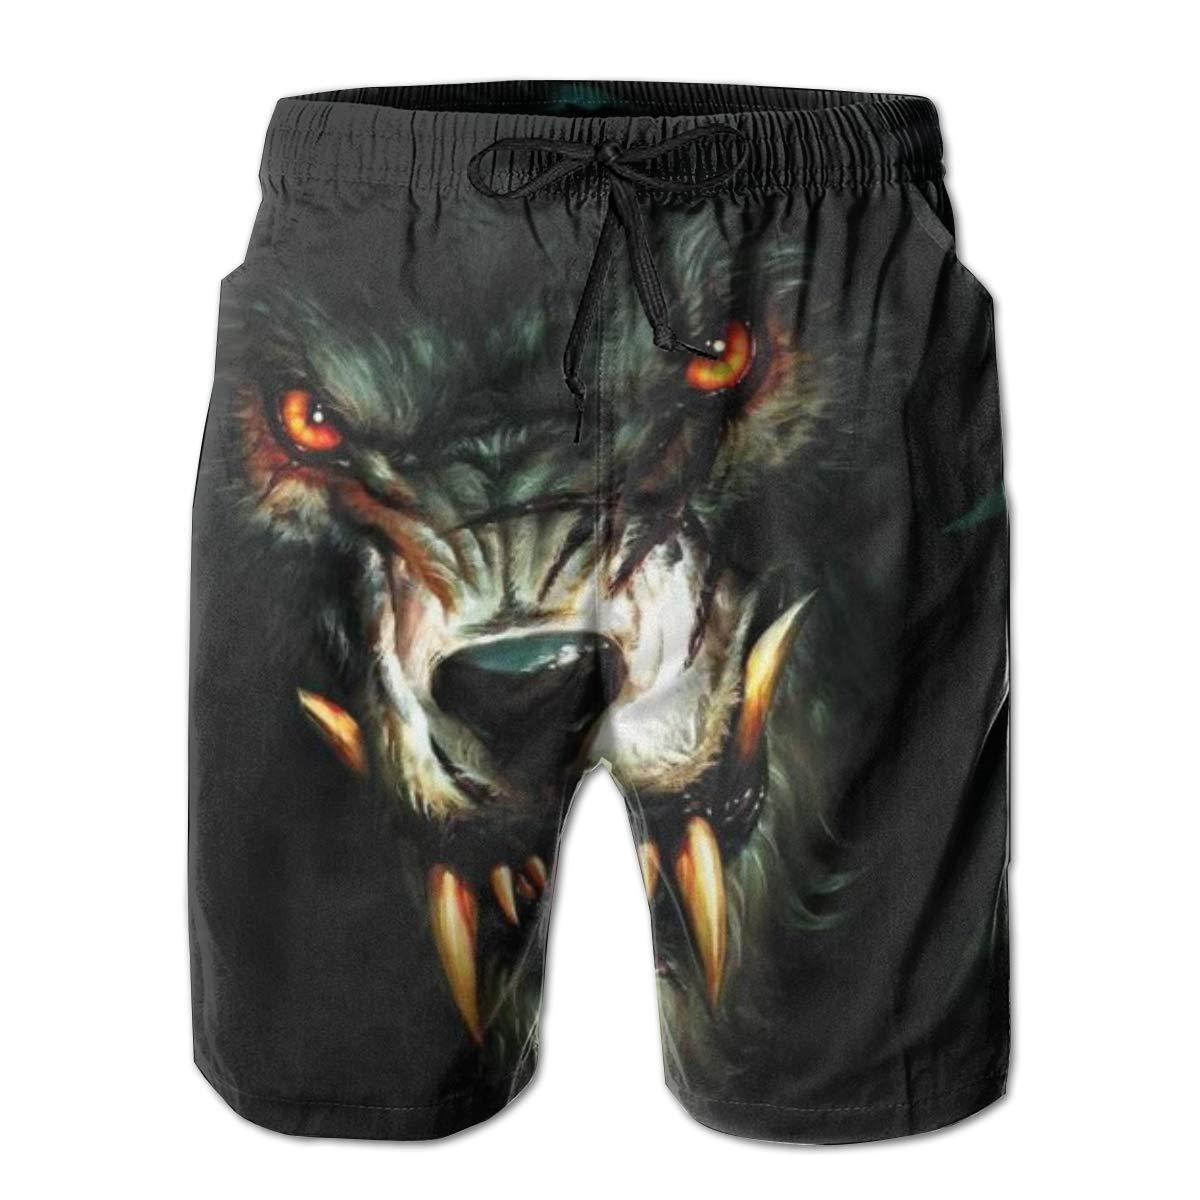 Wolf Mens Swim Trunks 3D Drawstring Beach Board Shorts Quick Dry Bathing Suitsr Running Board Shorts